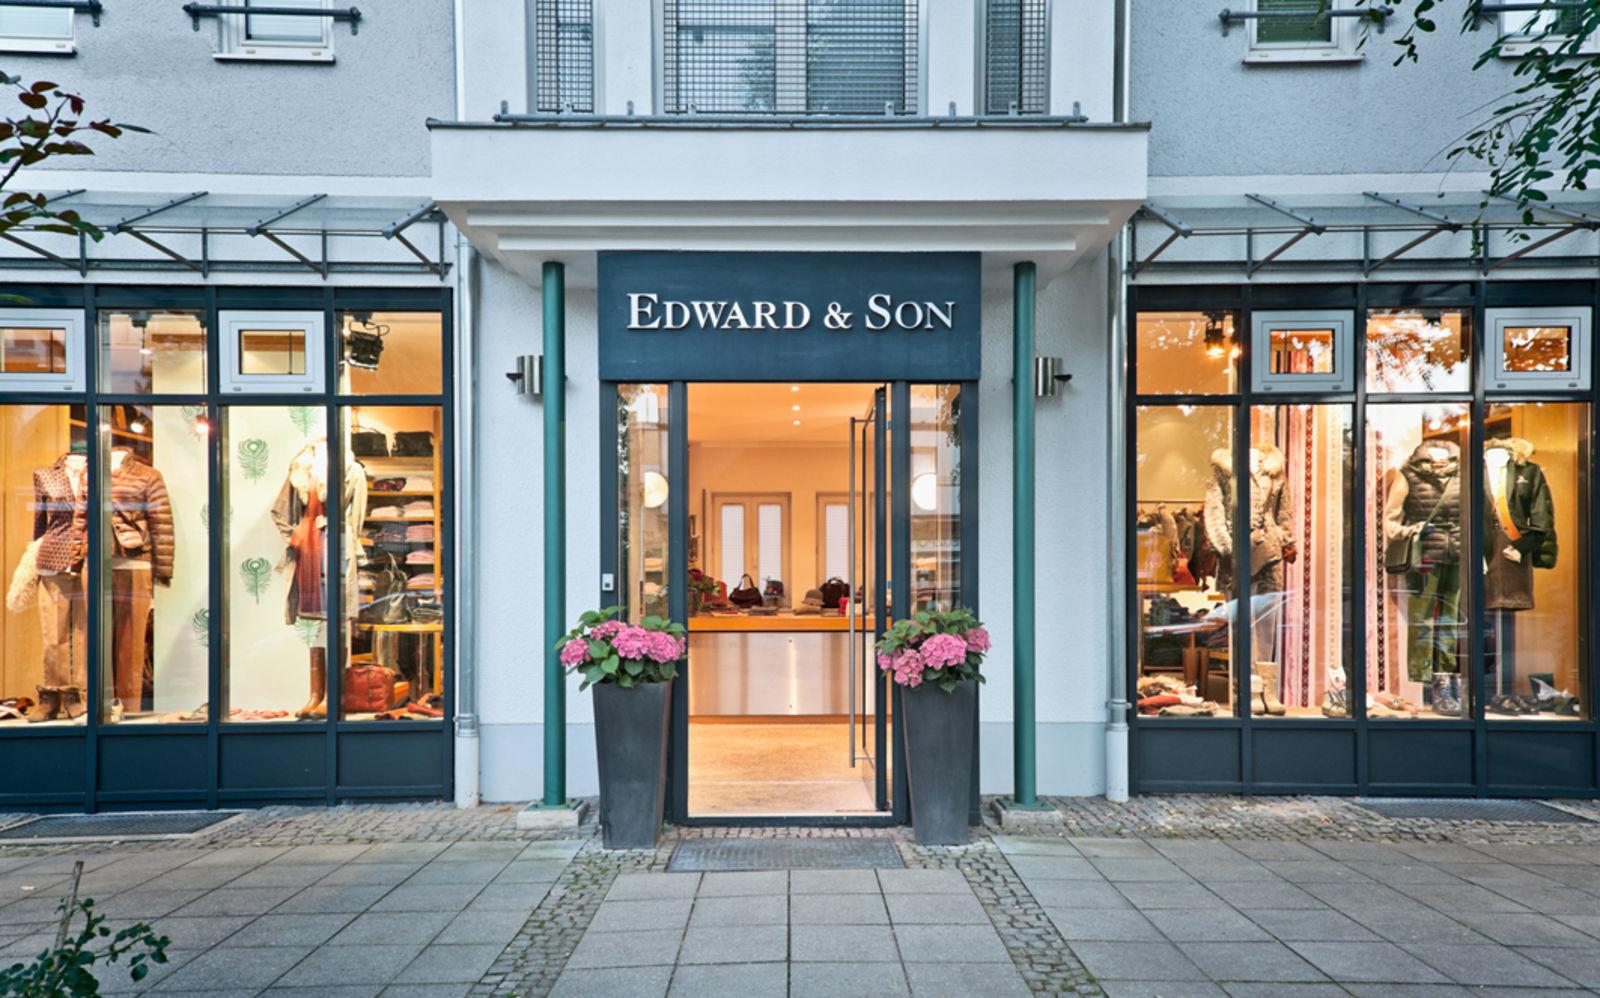 Edward & Son in München (Bild 1)